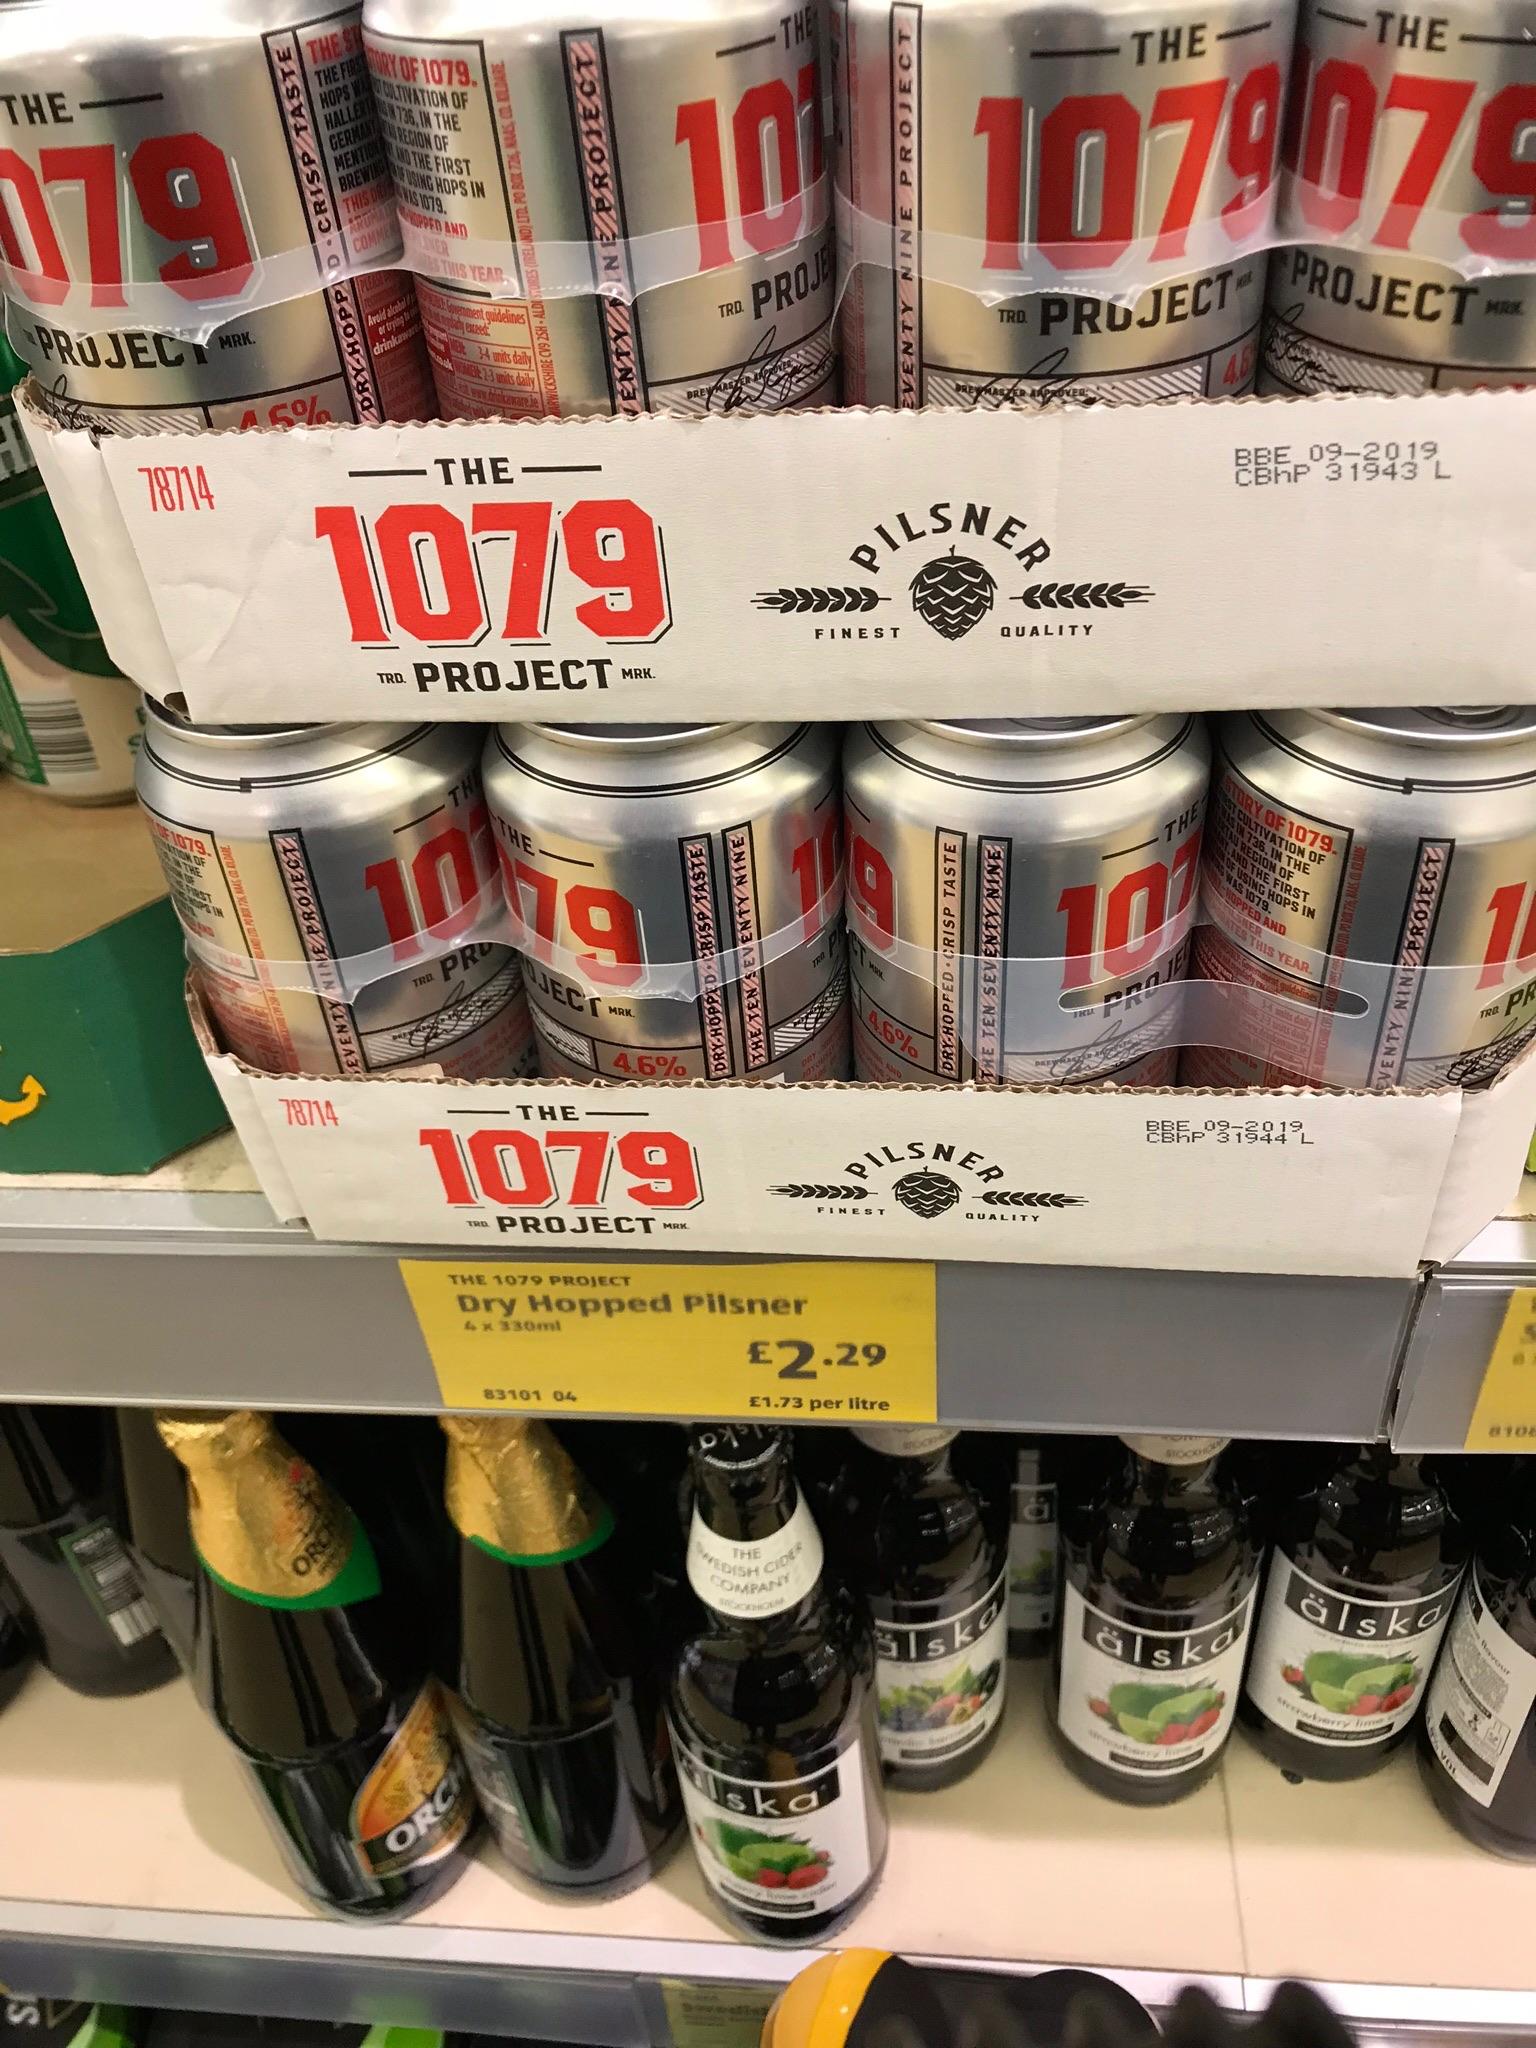 1079 Pilsner Lager 4 x 330ml cans £2.29 @ Aldi